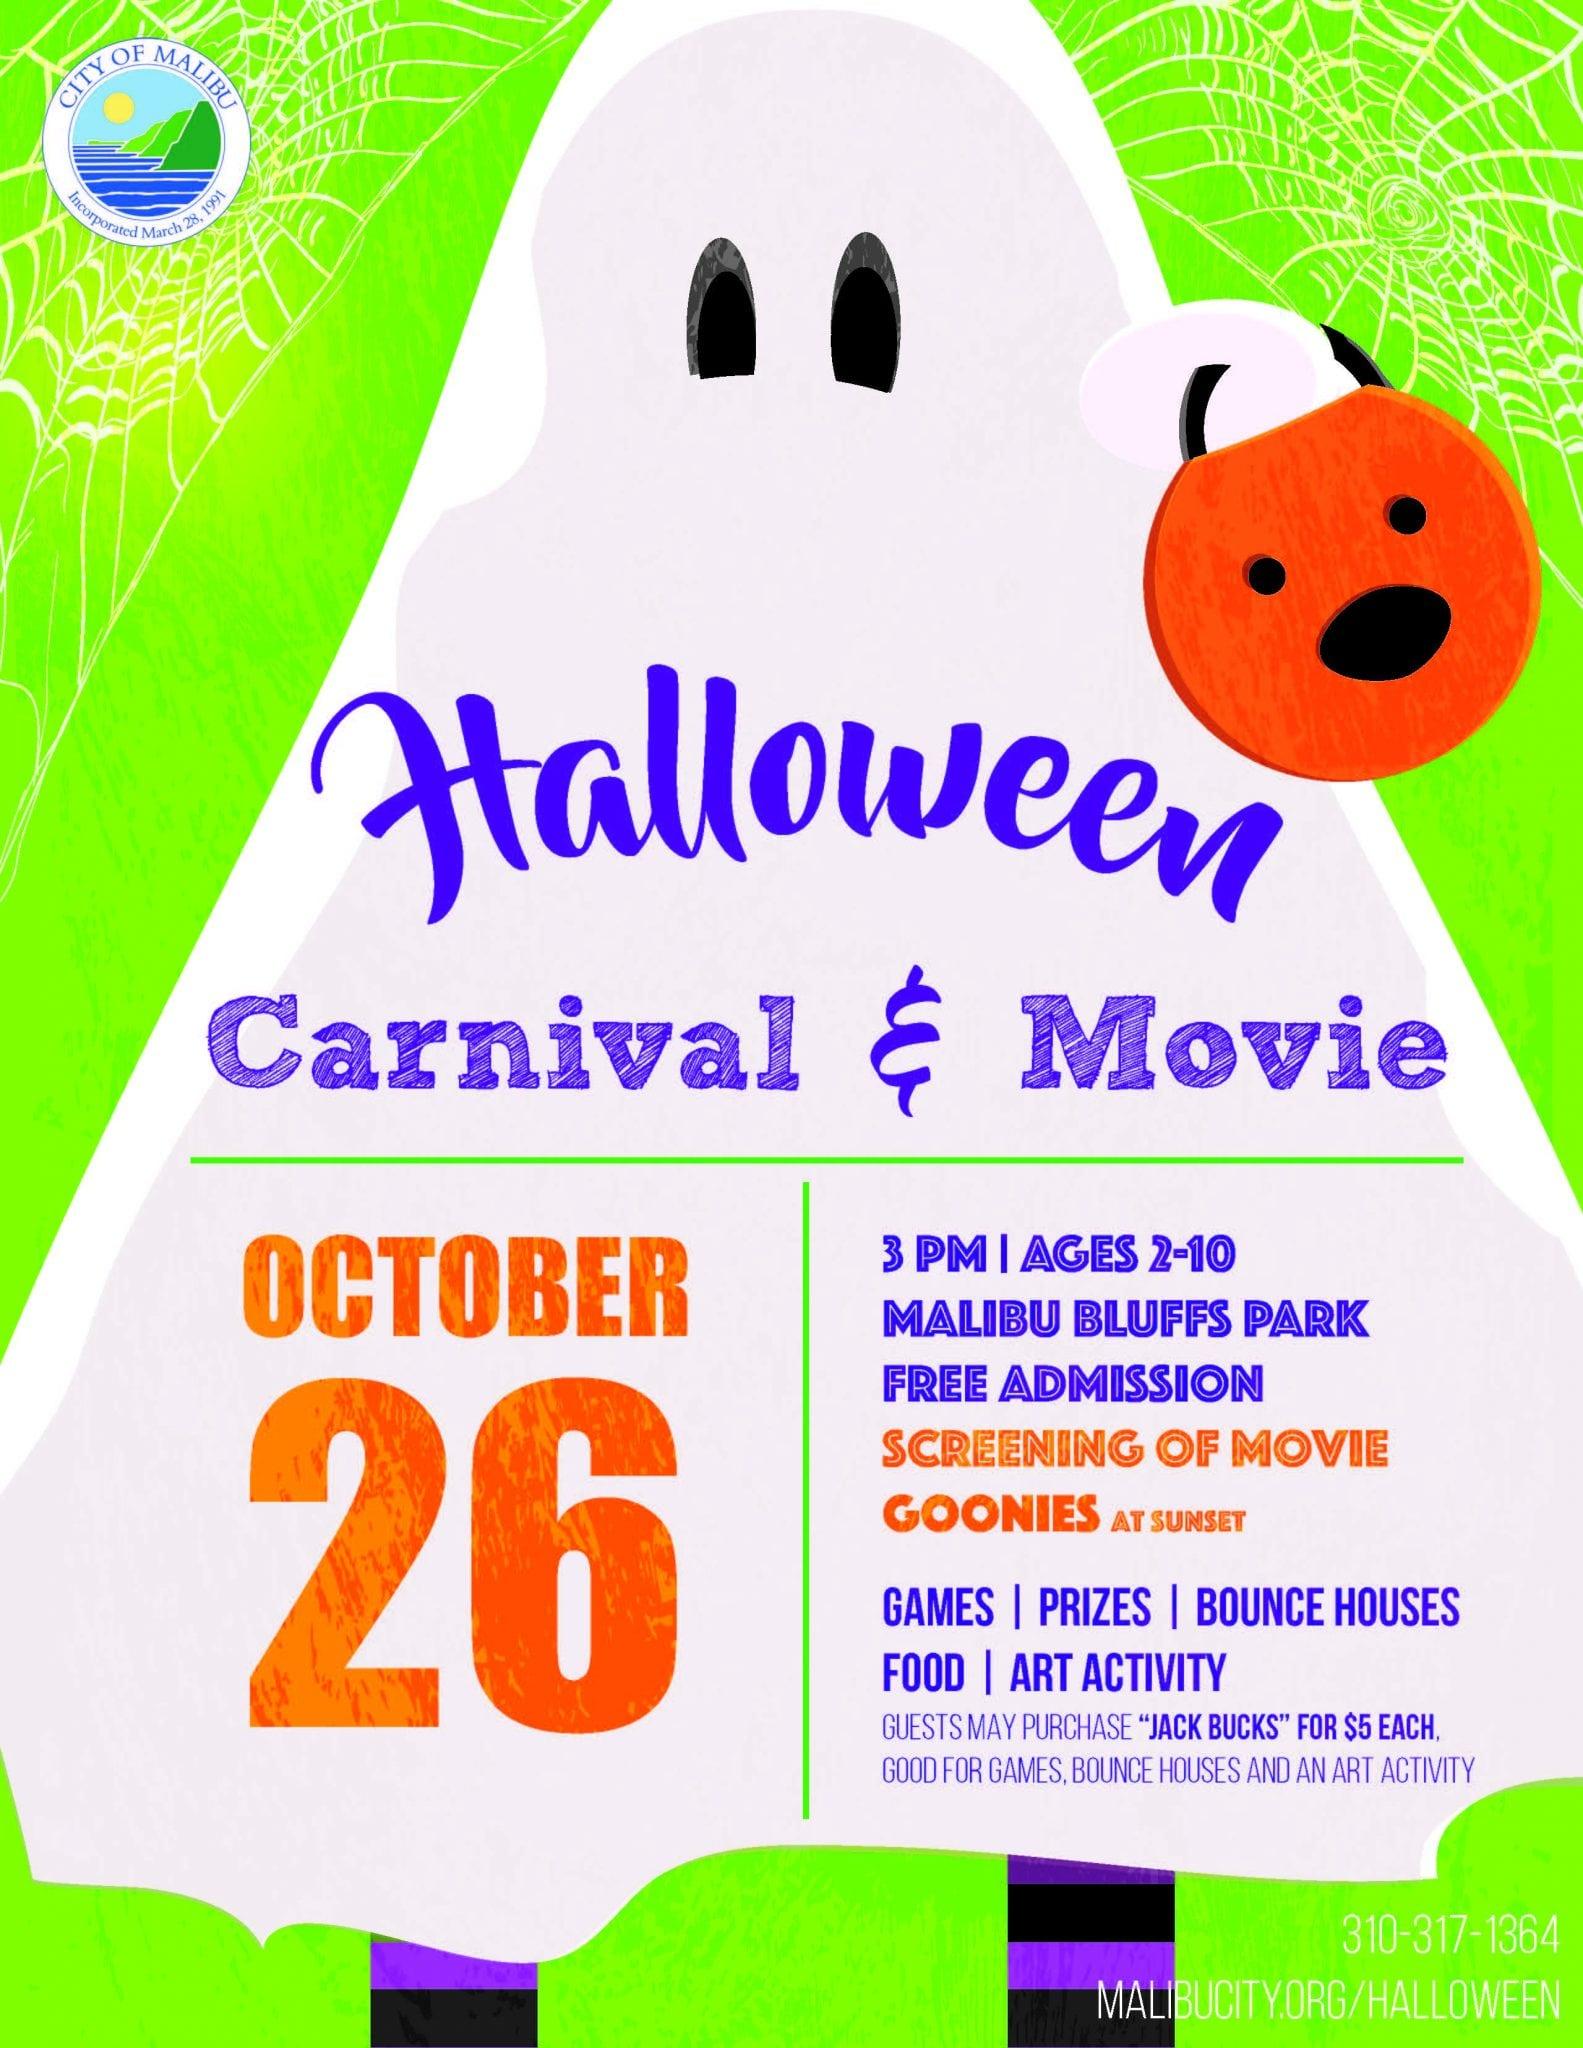 Malibu Halloween Carnival & Movie